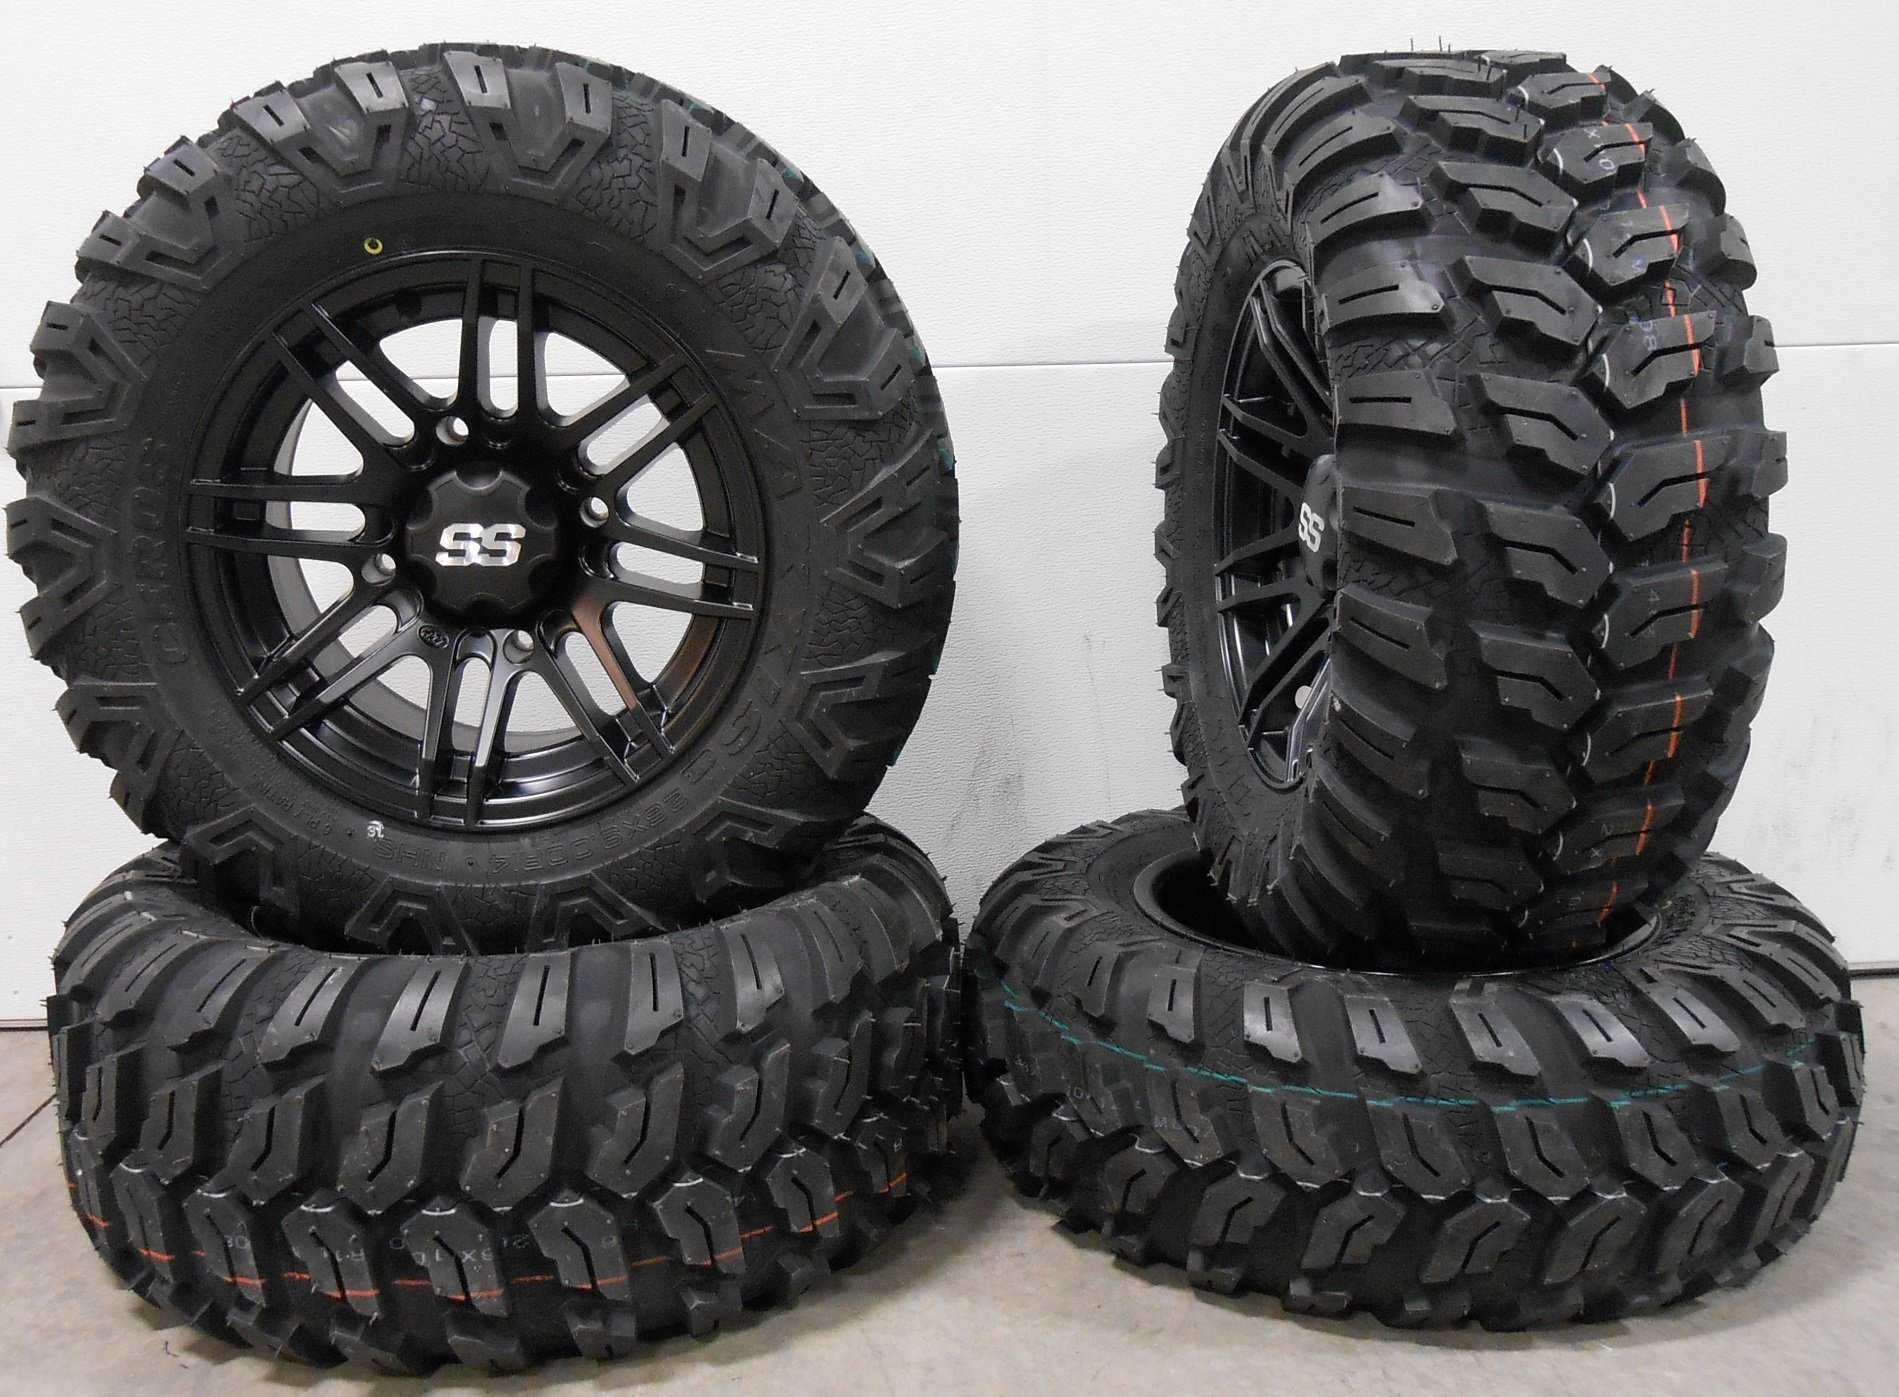 Bundle - 9 Items: ITP SS316 14'' Wheels Black Ops 26'' Ceros Tires [4x156 Bolt Pattern 3/8x24 Lug Kit]